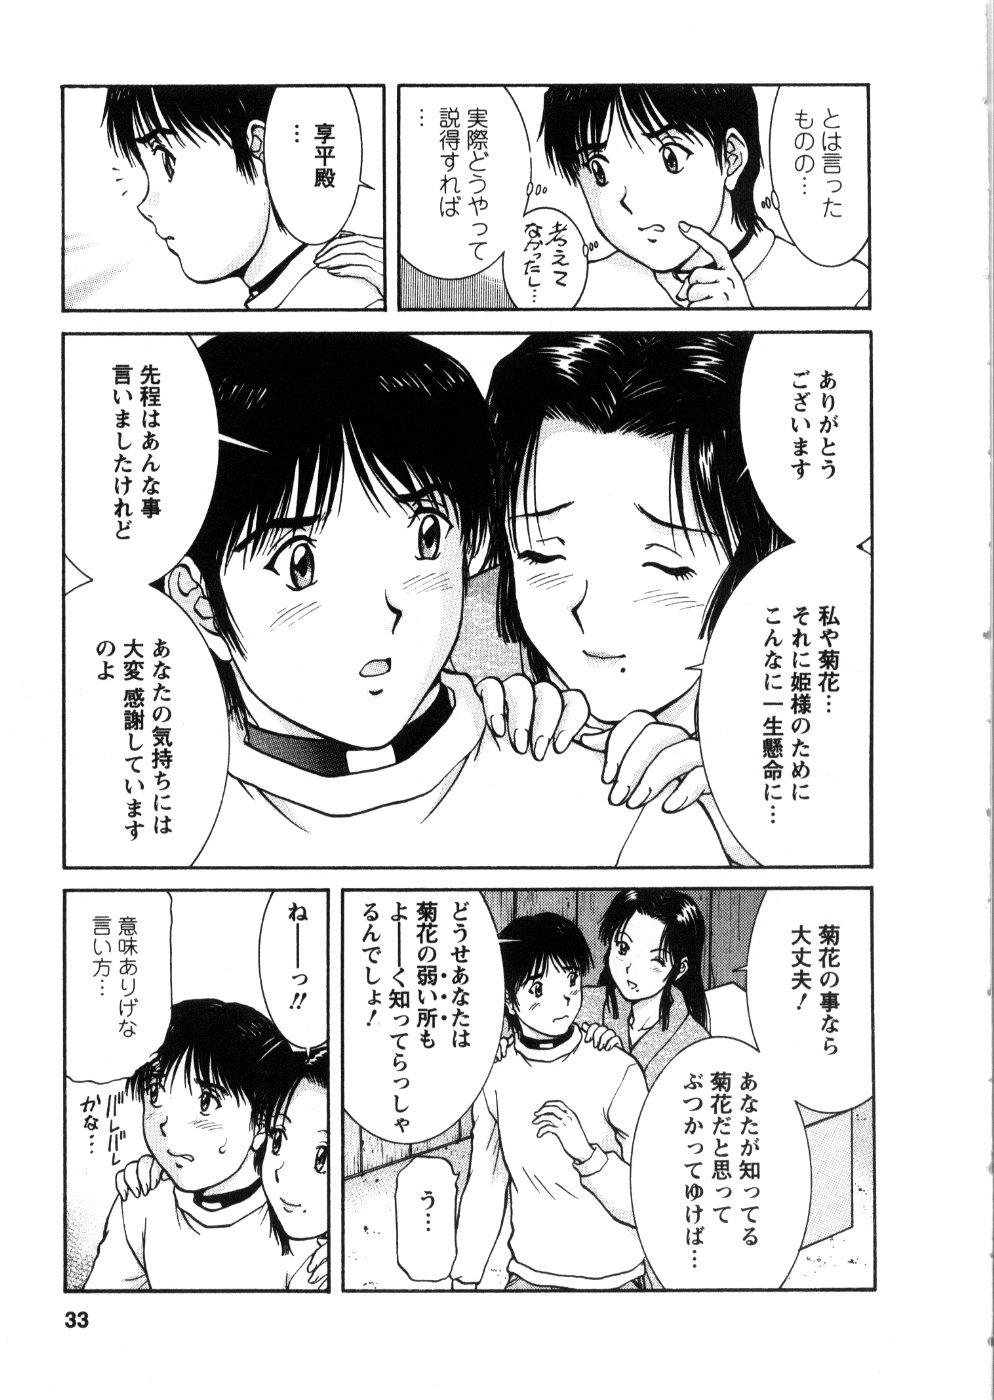 Oneechan-tachi ga Yatte Kuru 03 34